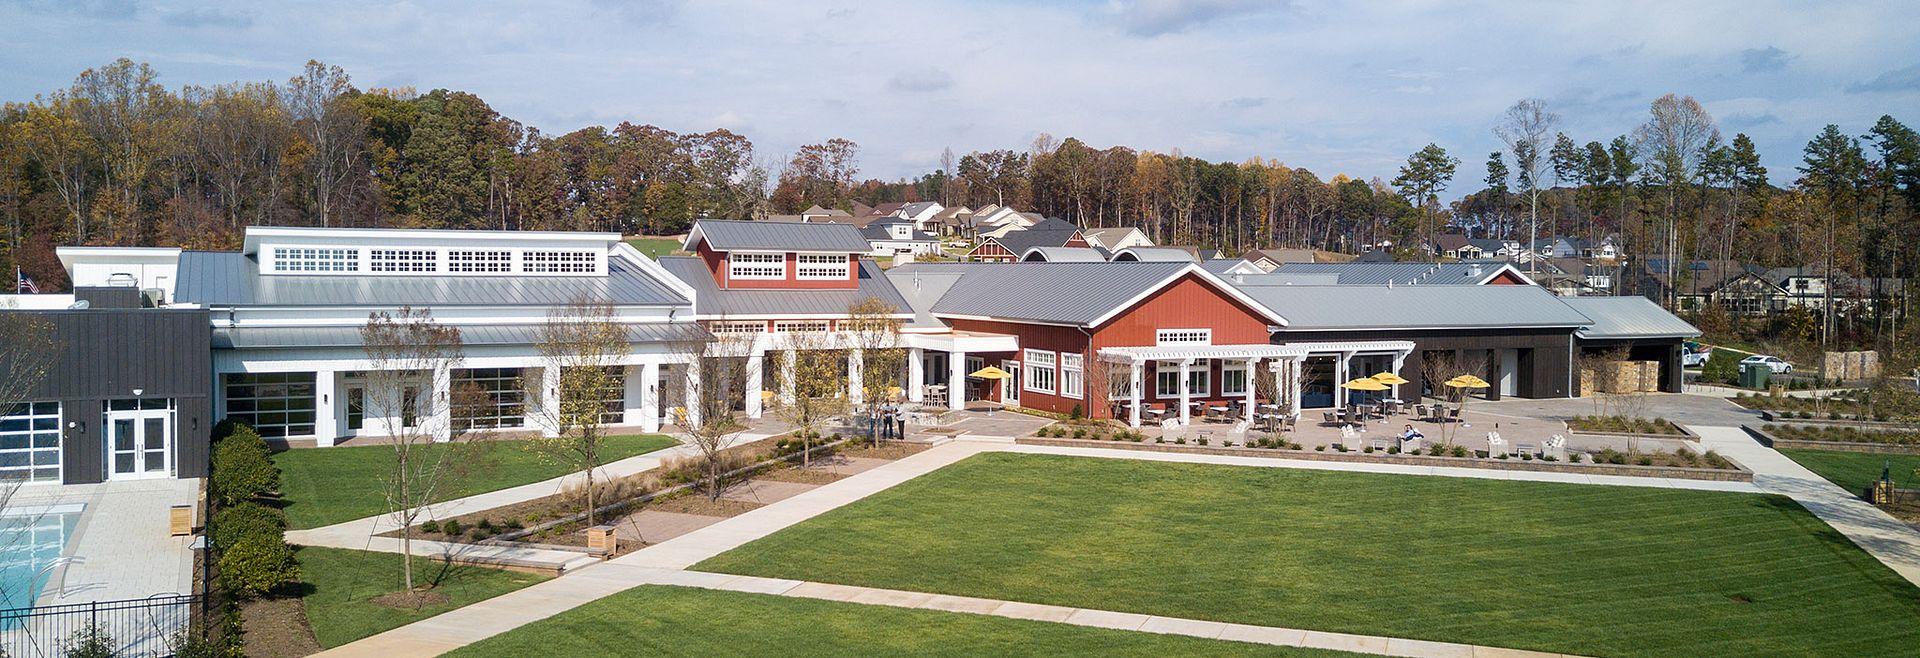 Twin Mills Club Drone View